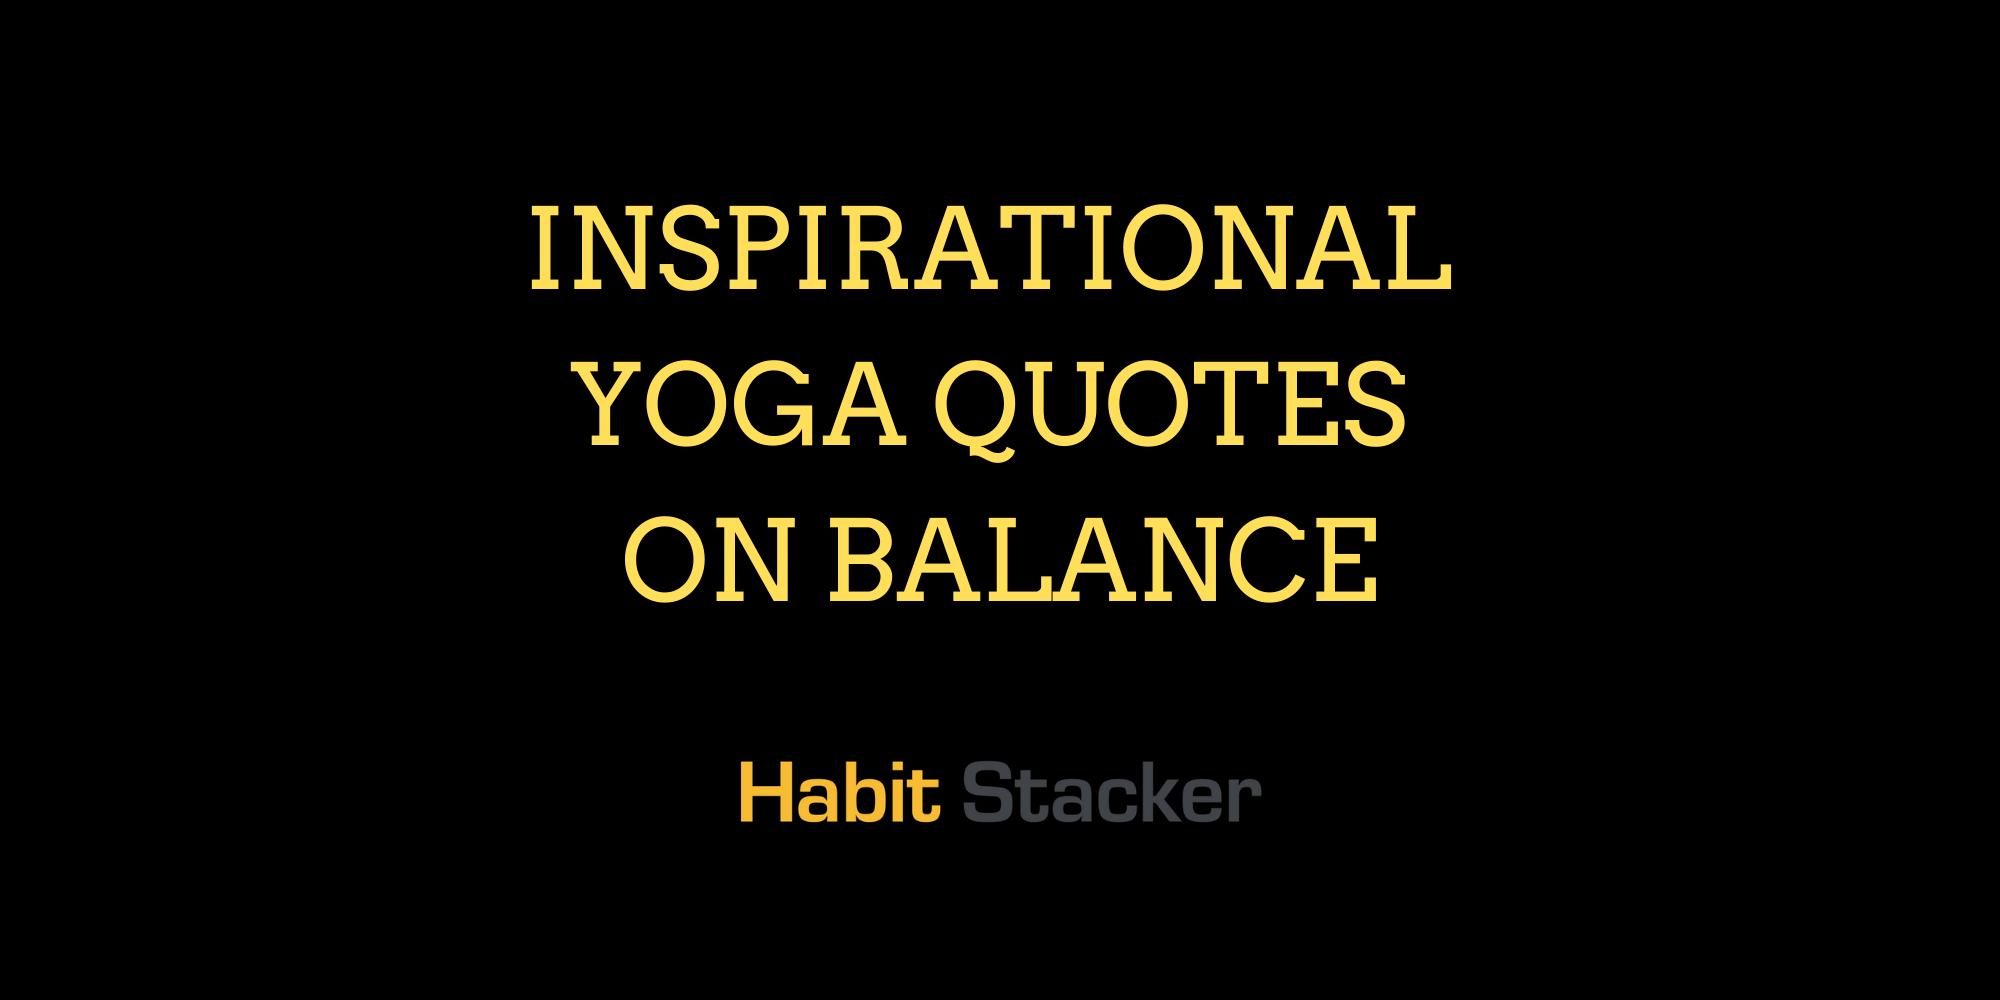 25 Inspirational Yoga Quotes On Balance Habit Stacker